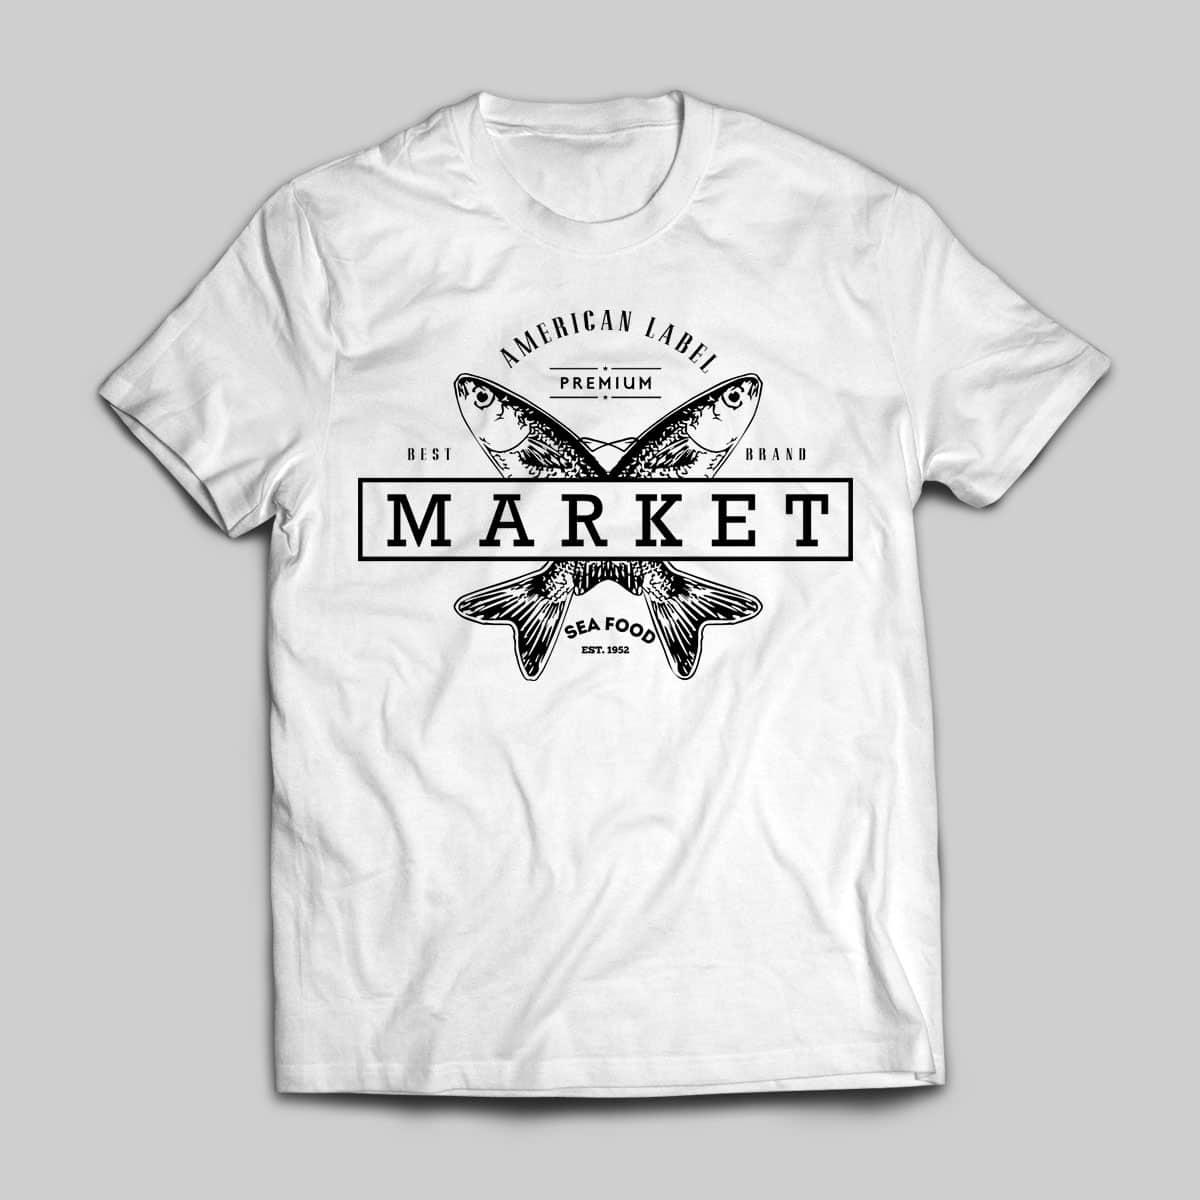 Market T-Shirt via @GGeorgina_mytimelessfootsteps/